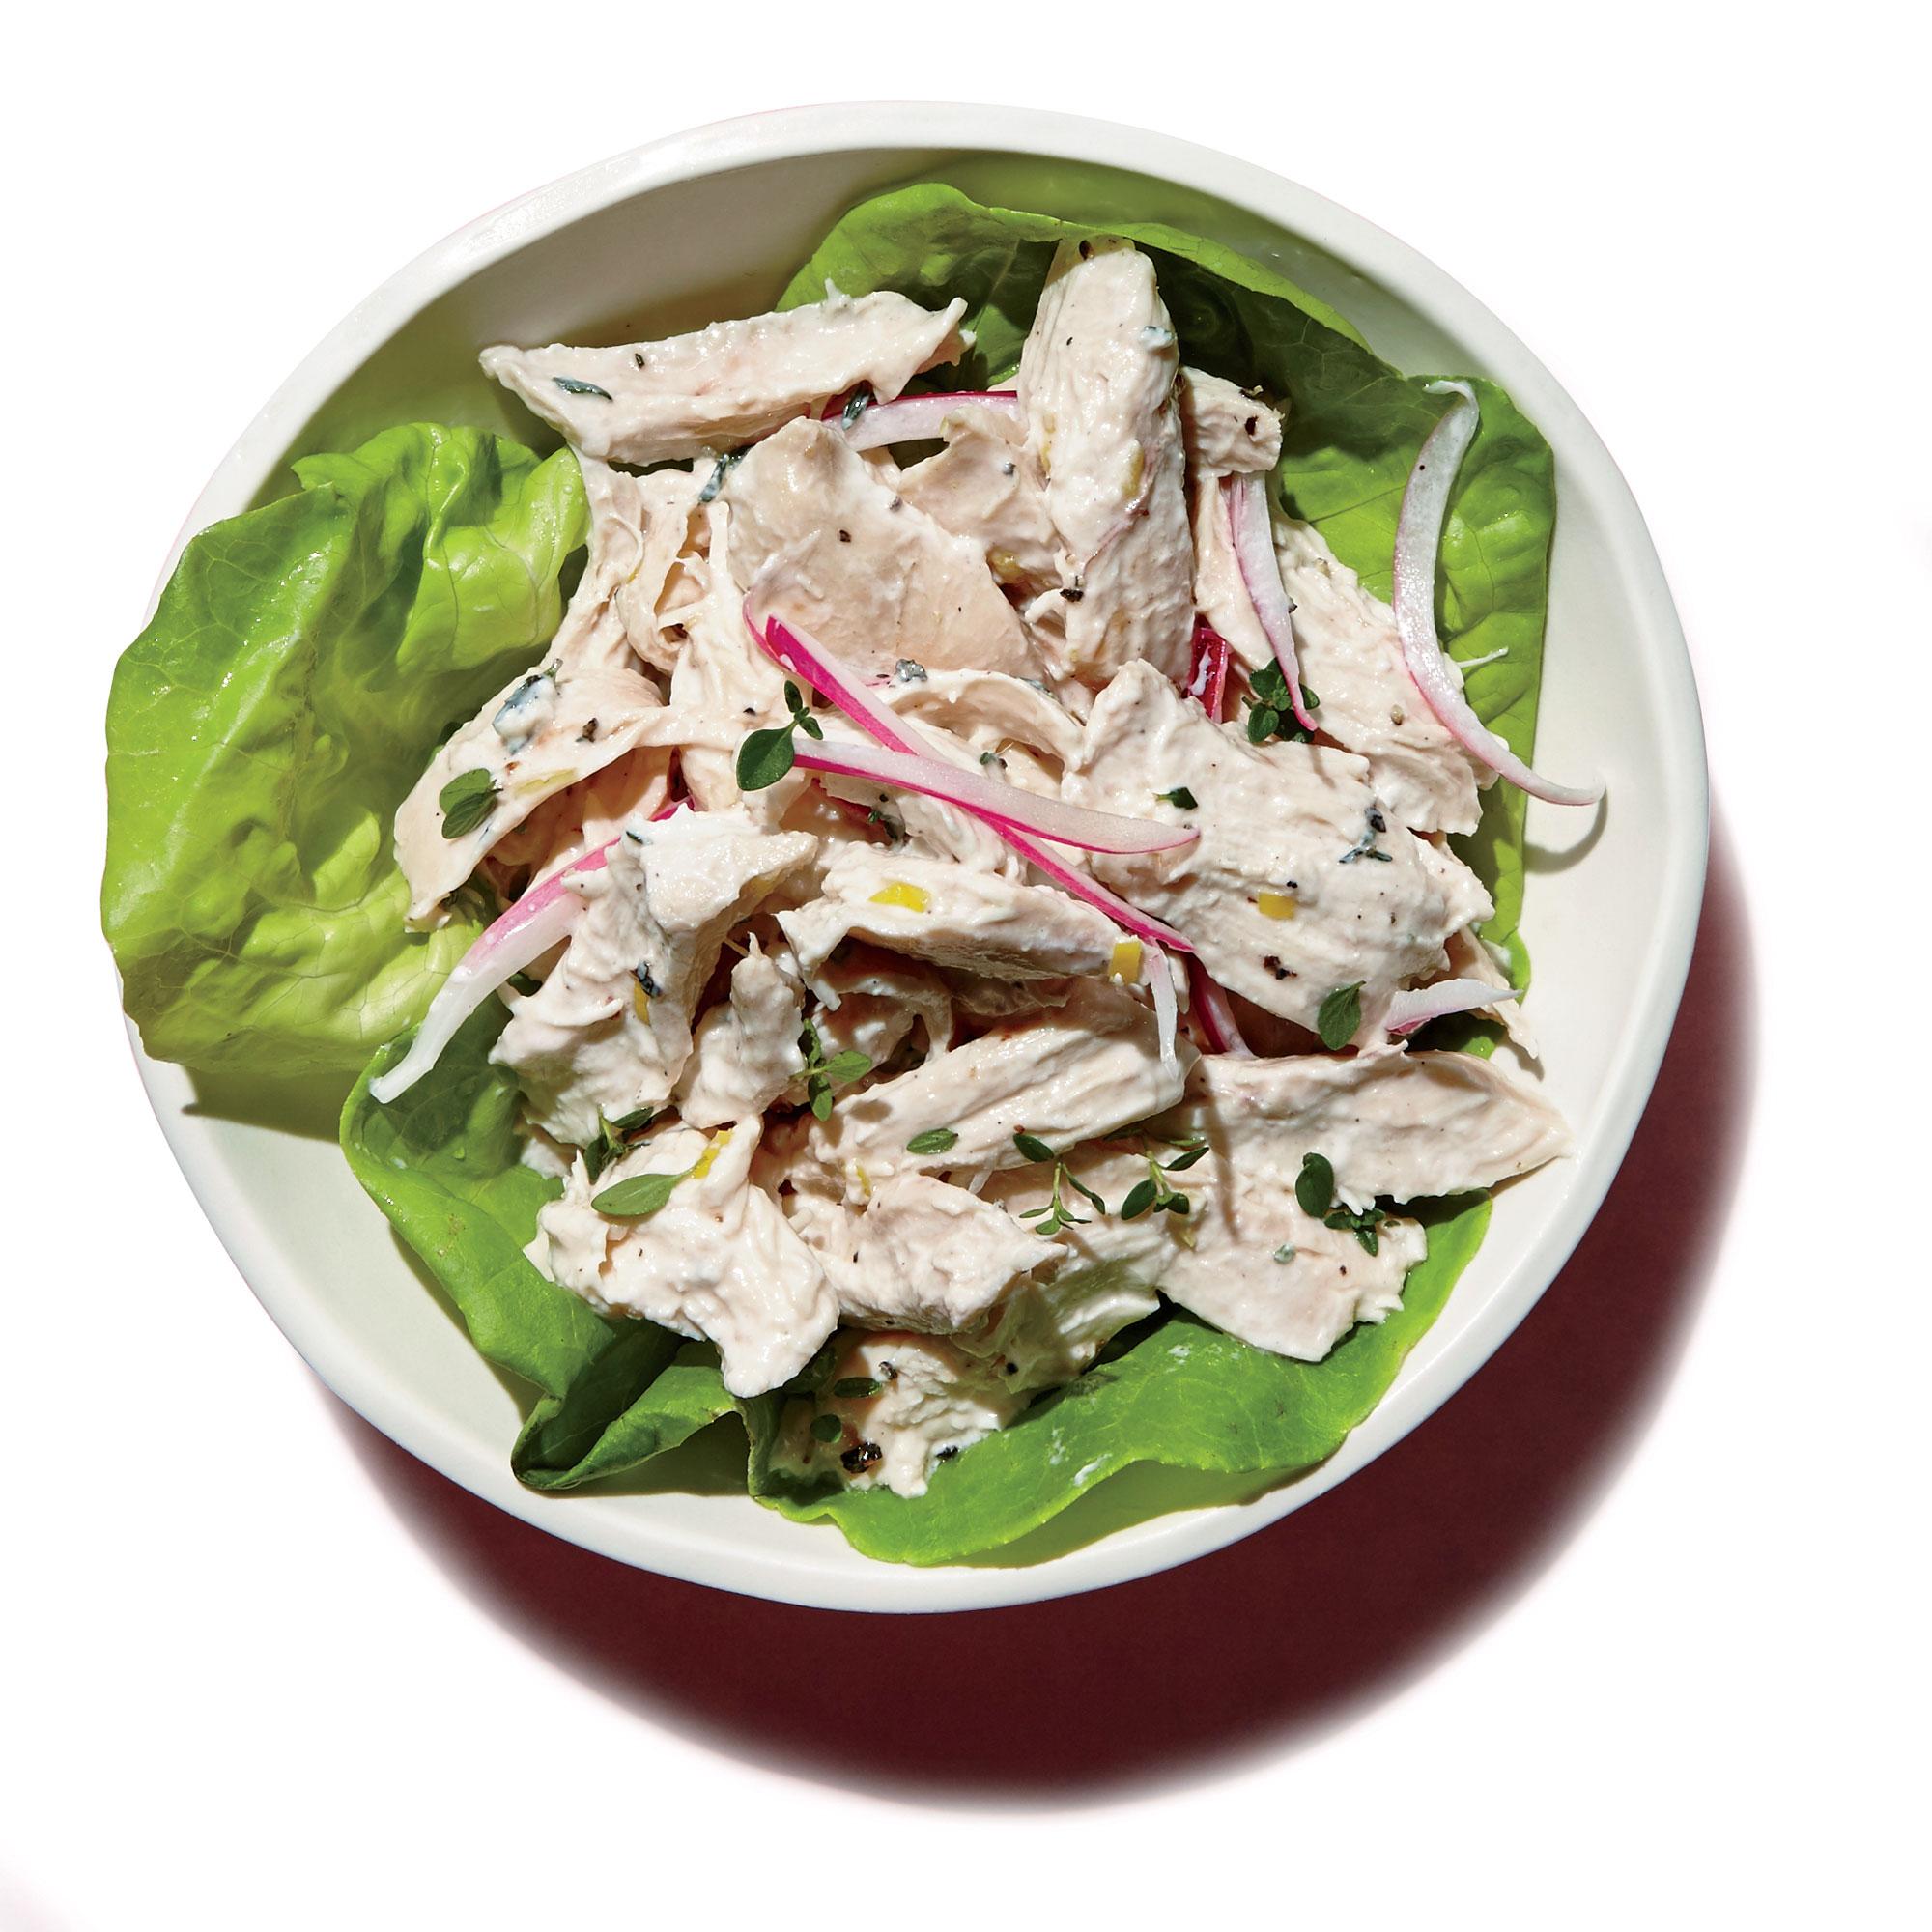 Lemon-Thyme Chicken Salad